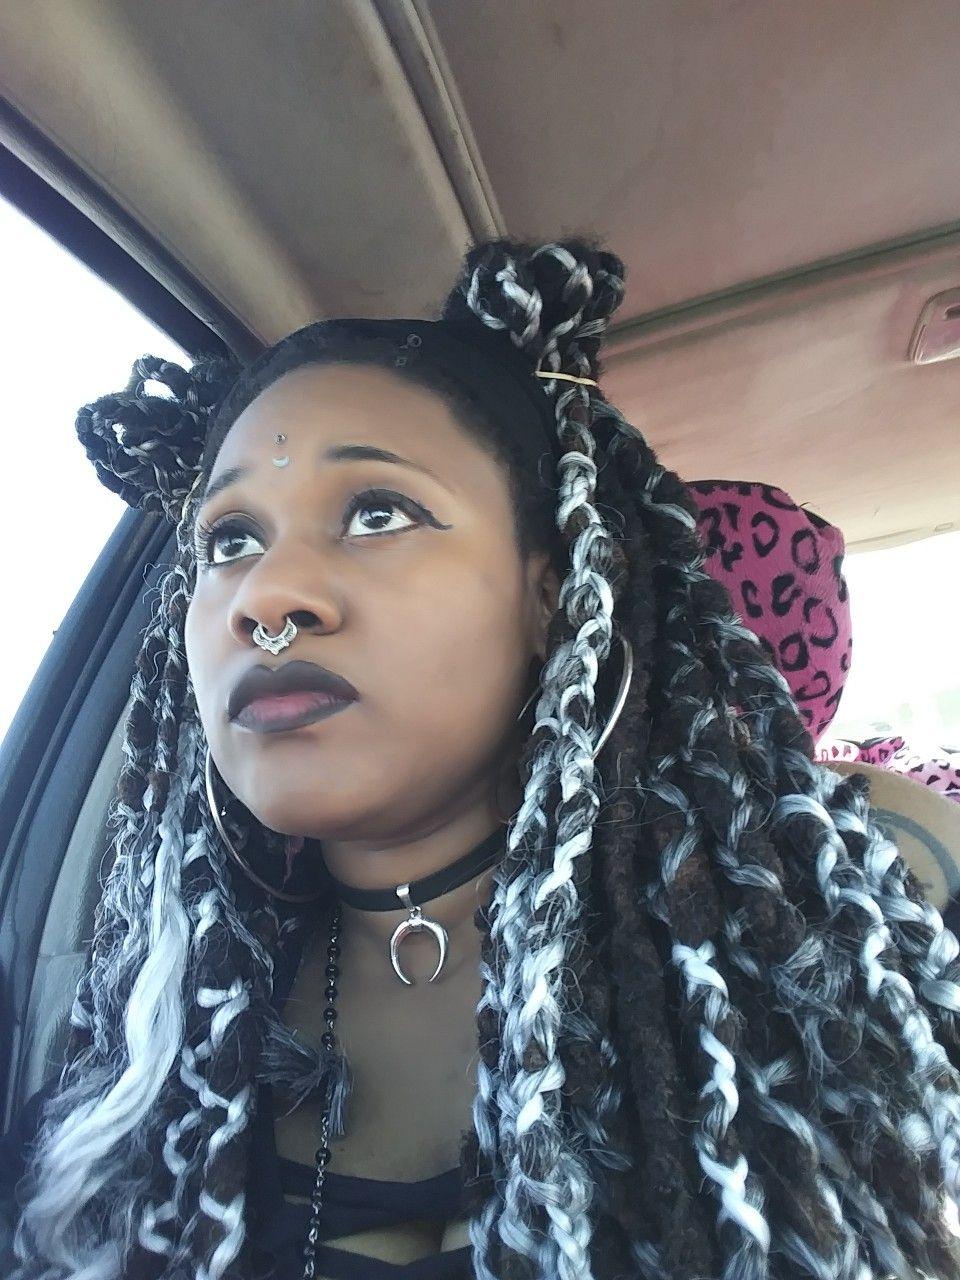 Pin by 𝓶𝓫 on afropunk pinterest black goth alternative